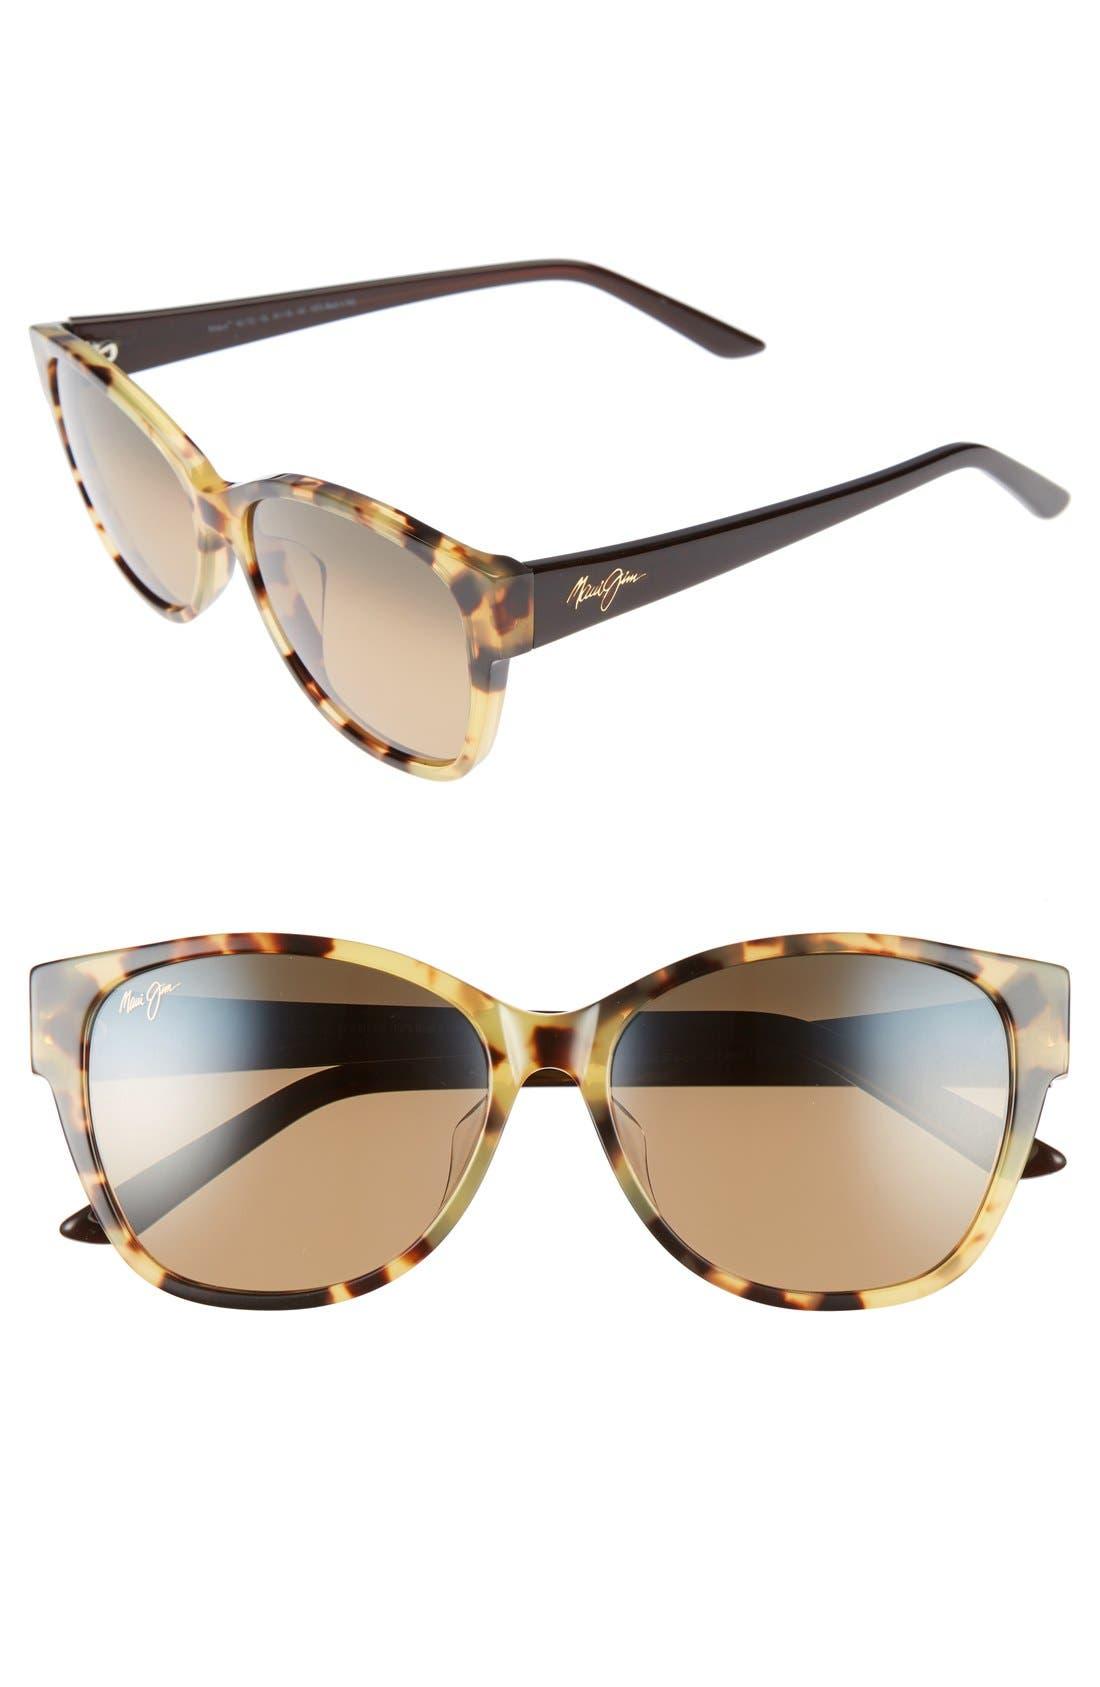 Maui Jim Summer Time 5m Polarizedplus2 Cat Eye Sunglasses - Tokyo Tortoise/ Hcl Bronze